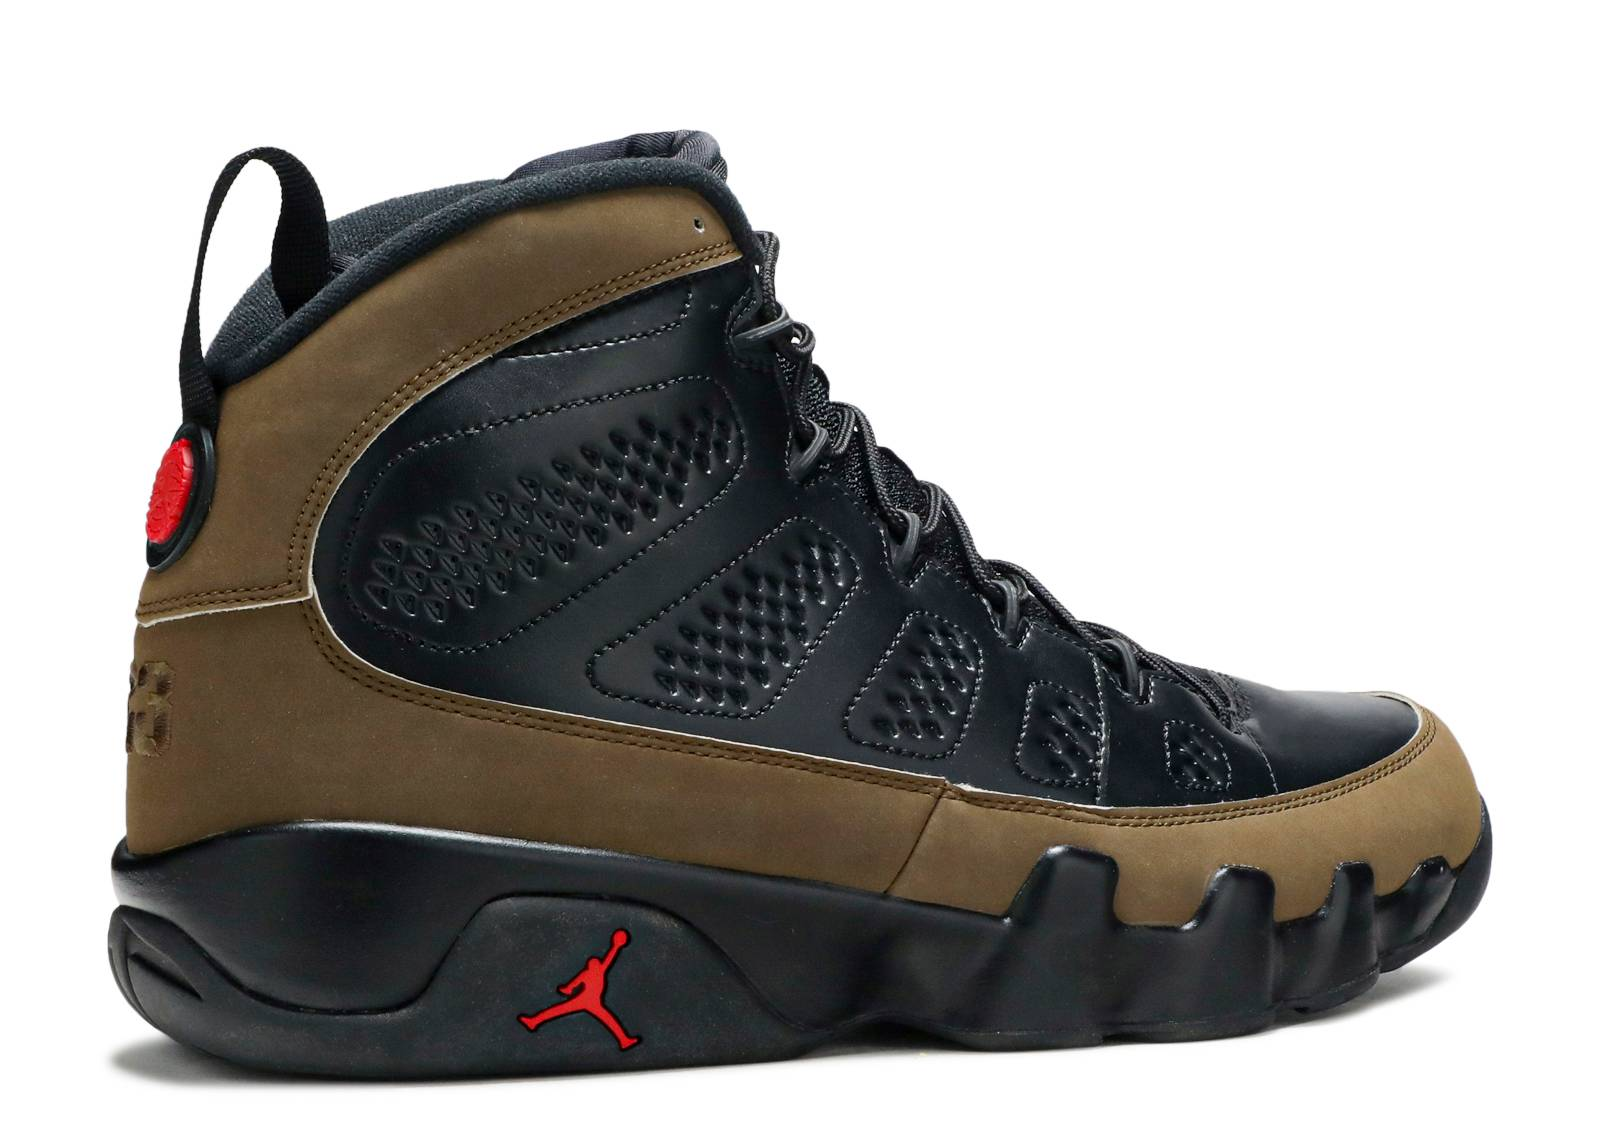 size 40 447ef 11a1c ... cheap air jordan 9 retro olive 2012 release 9eccc 8a4f5